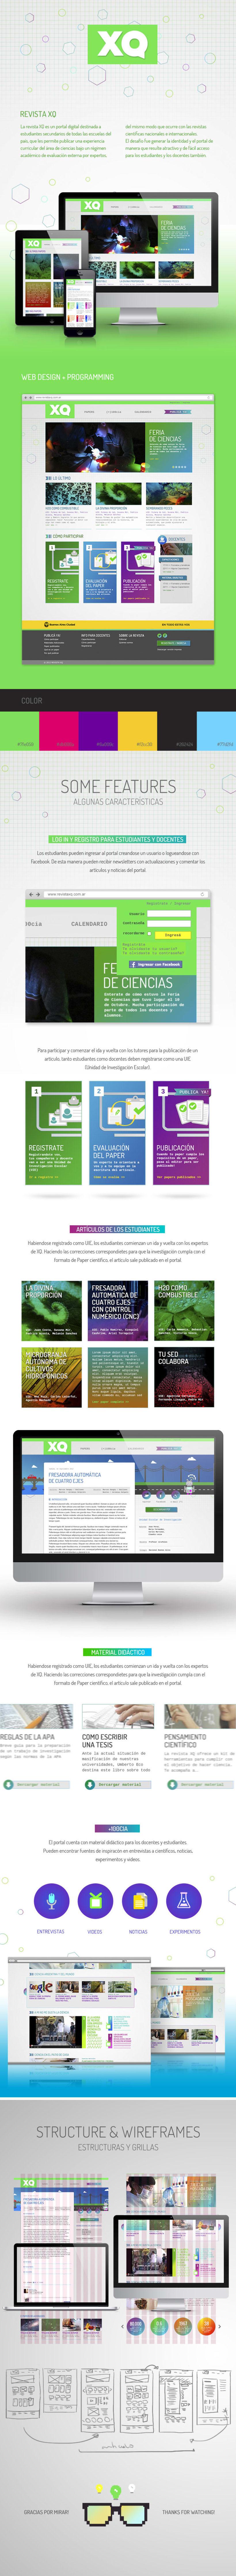 XQ Revista Digital -1